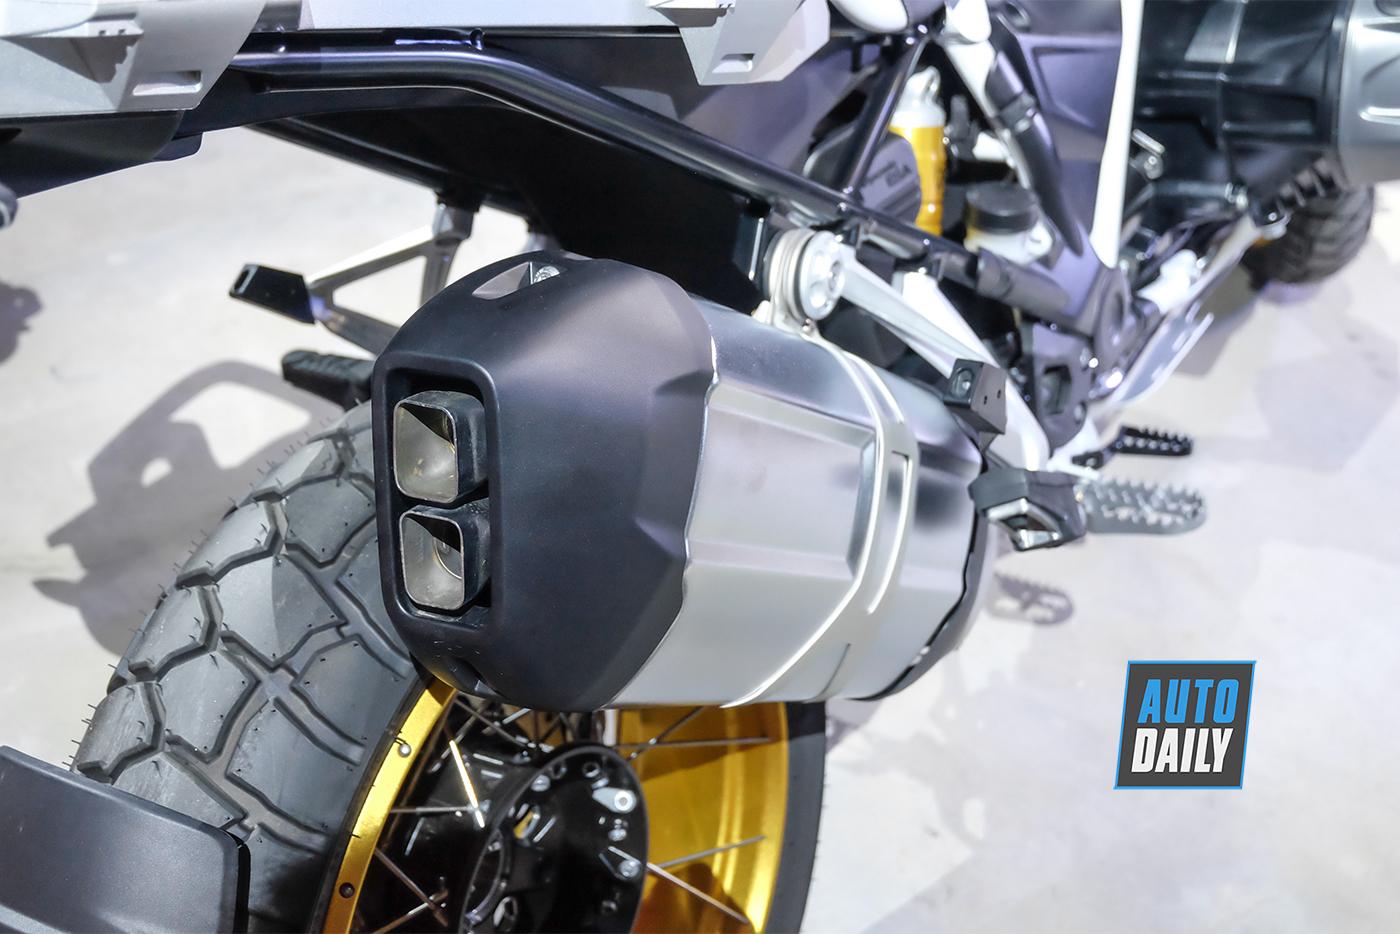 bmw-motorrad-r-1250-gs-2019-14.jpg